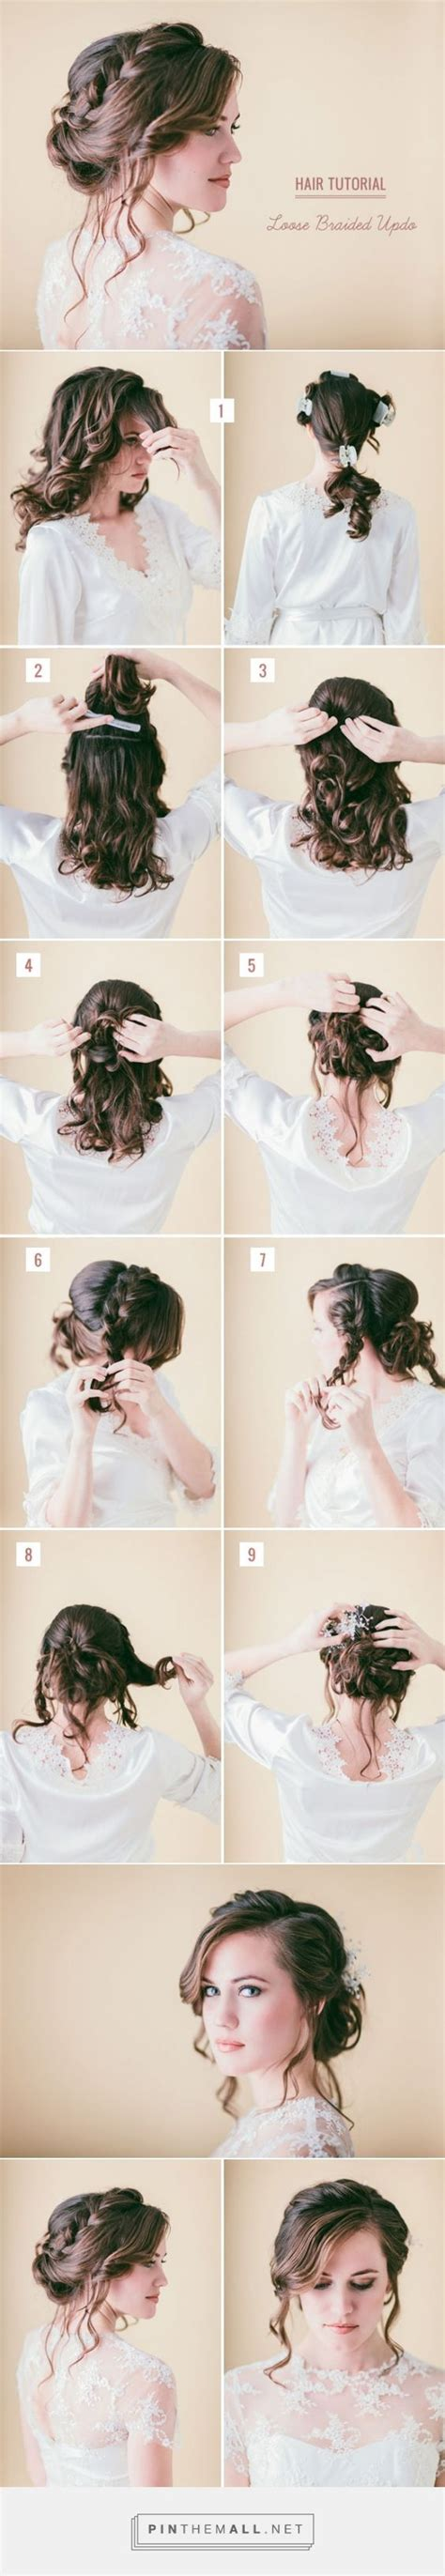 Hairstyles Tutorials by Best 25 Renaissance Hairstyles Ideas On